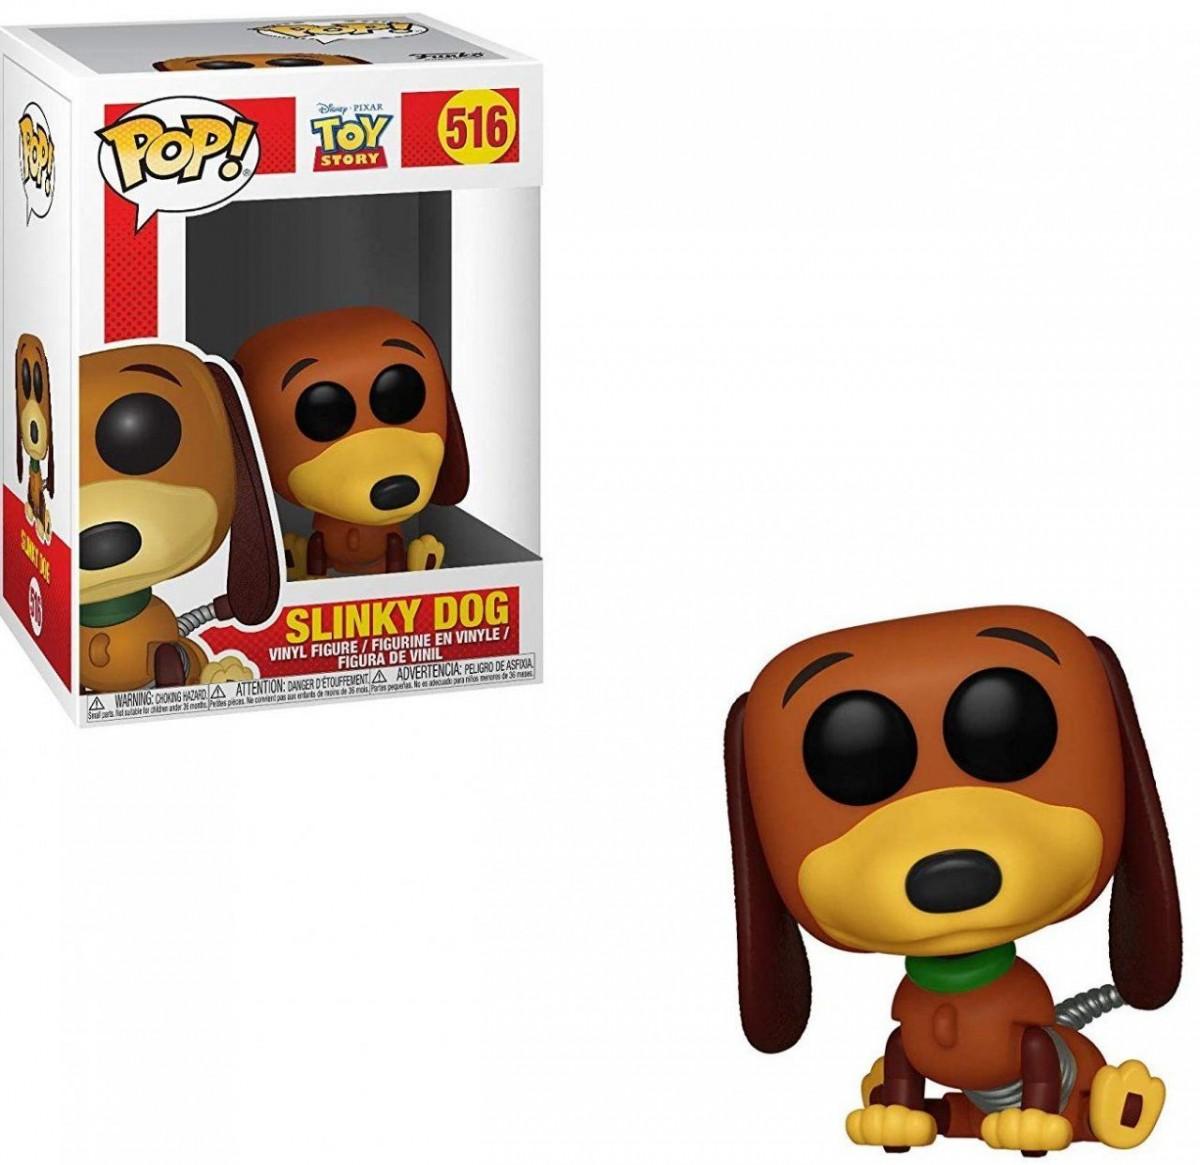 Фигурка Funko POP! Vinyl: Собачка Спиралька (Slinky Dog) История игрушек (Toy Story) (37010) 9,5 см